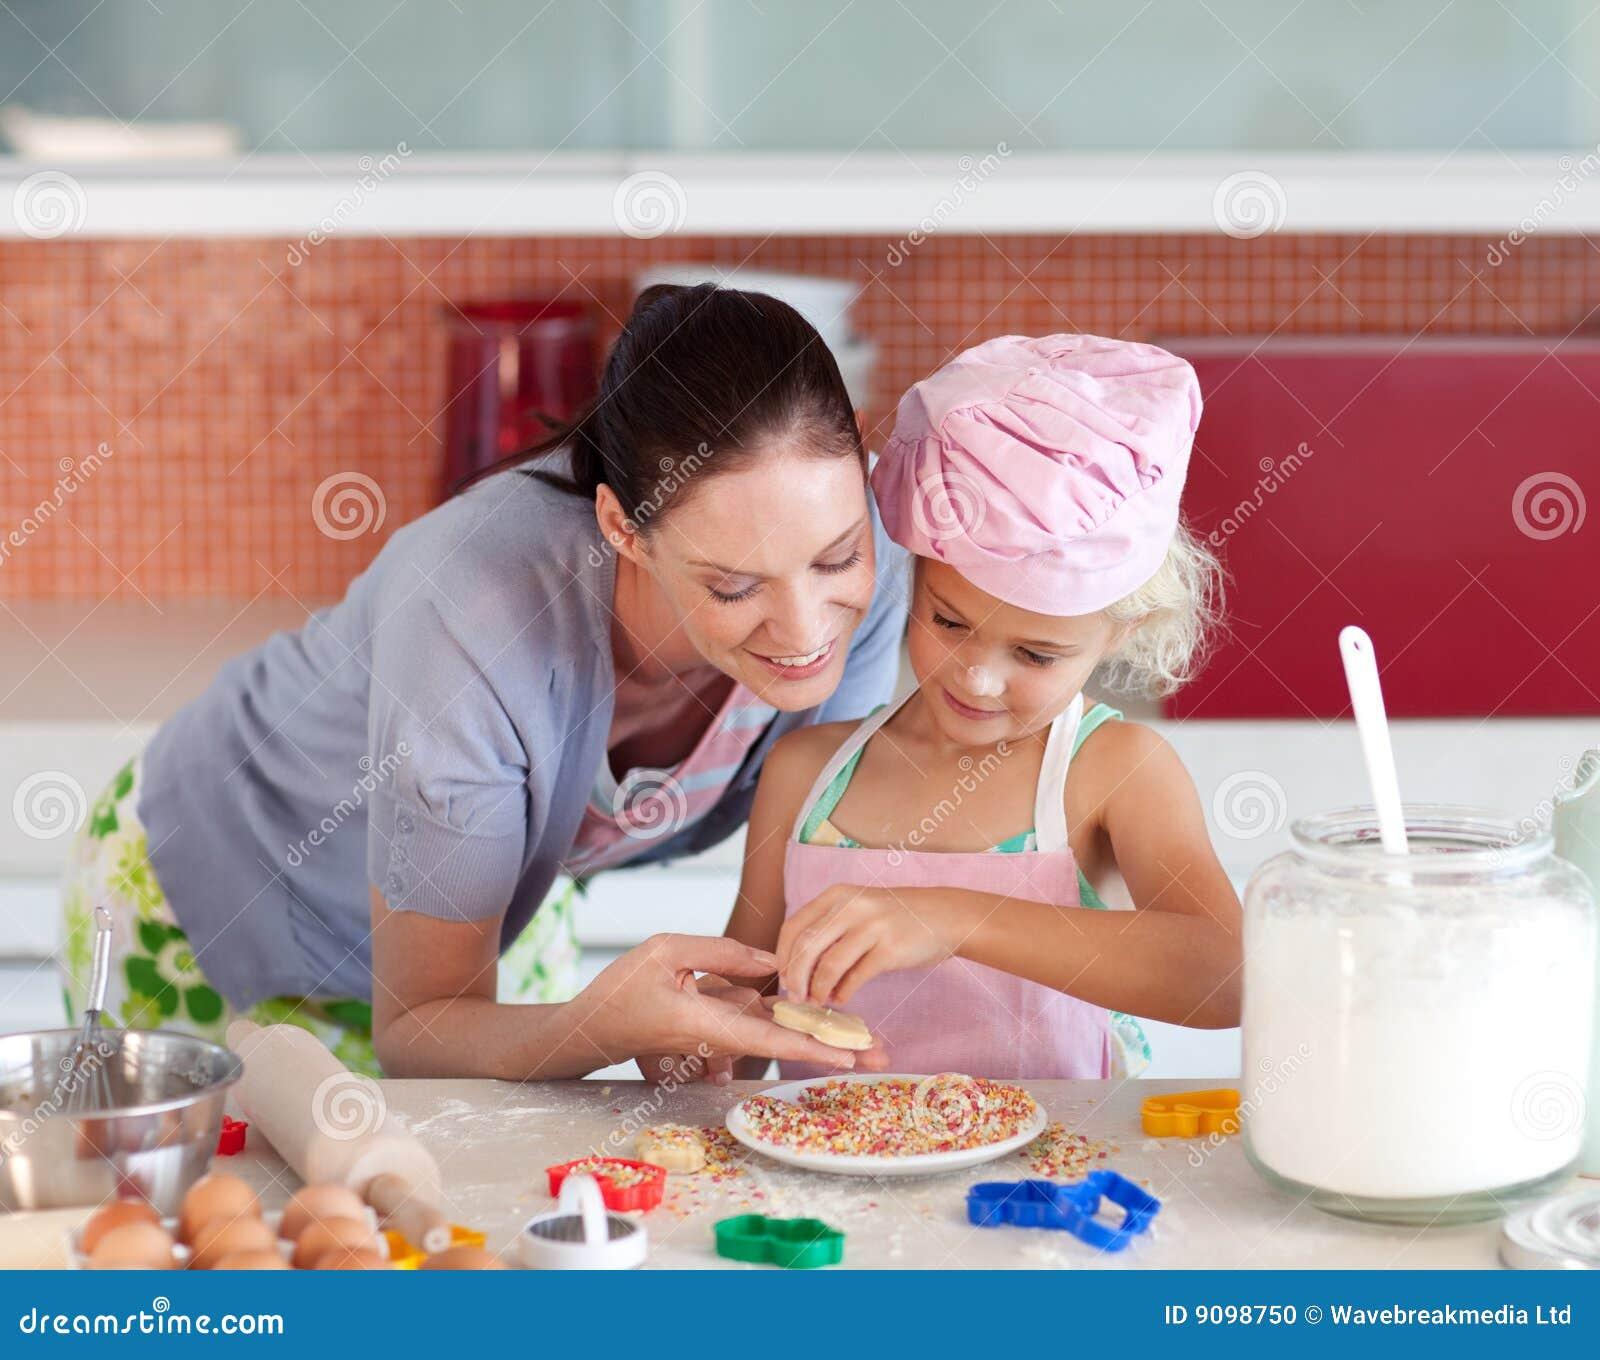 Madre E Hijo Follando En La Cocina   Filmvz Portal